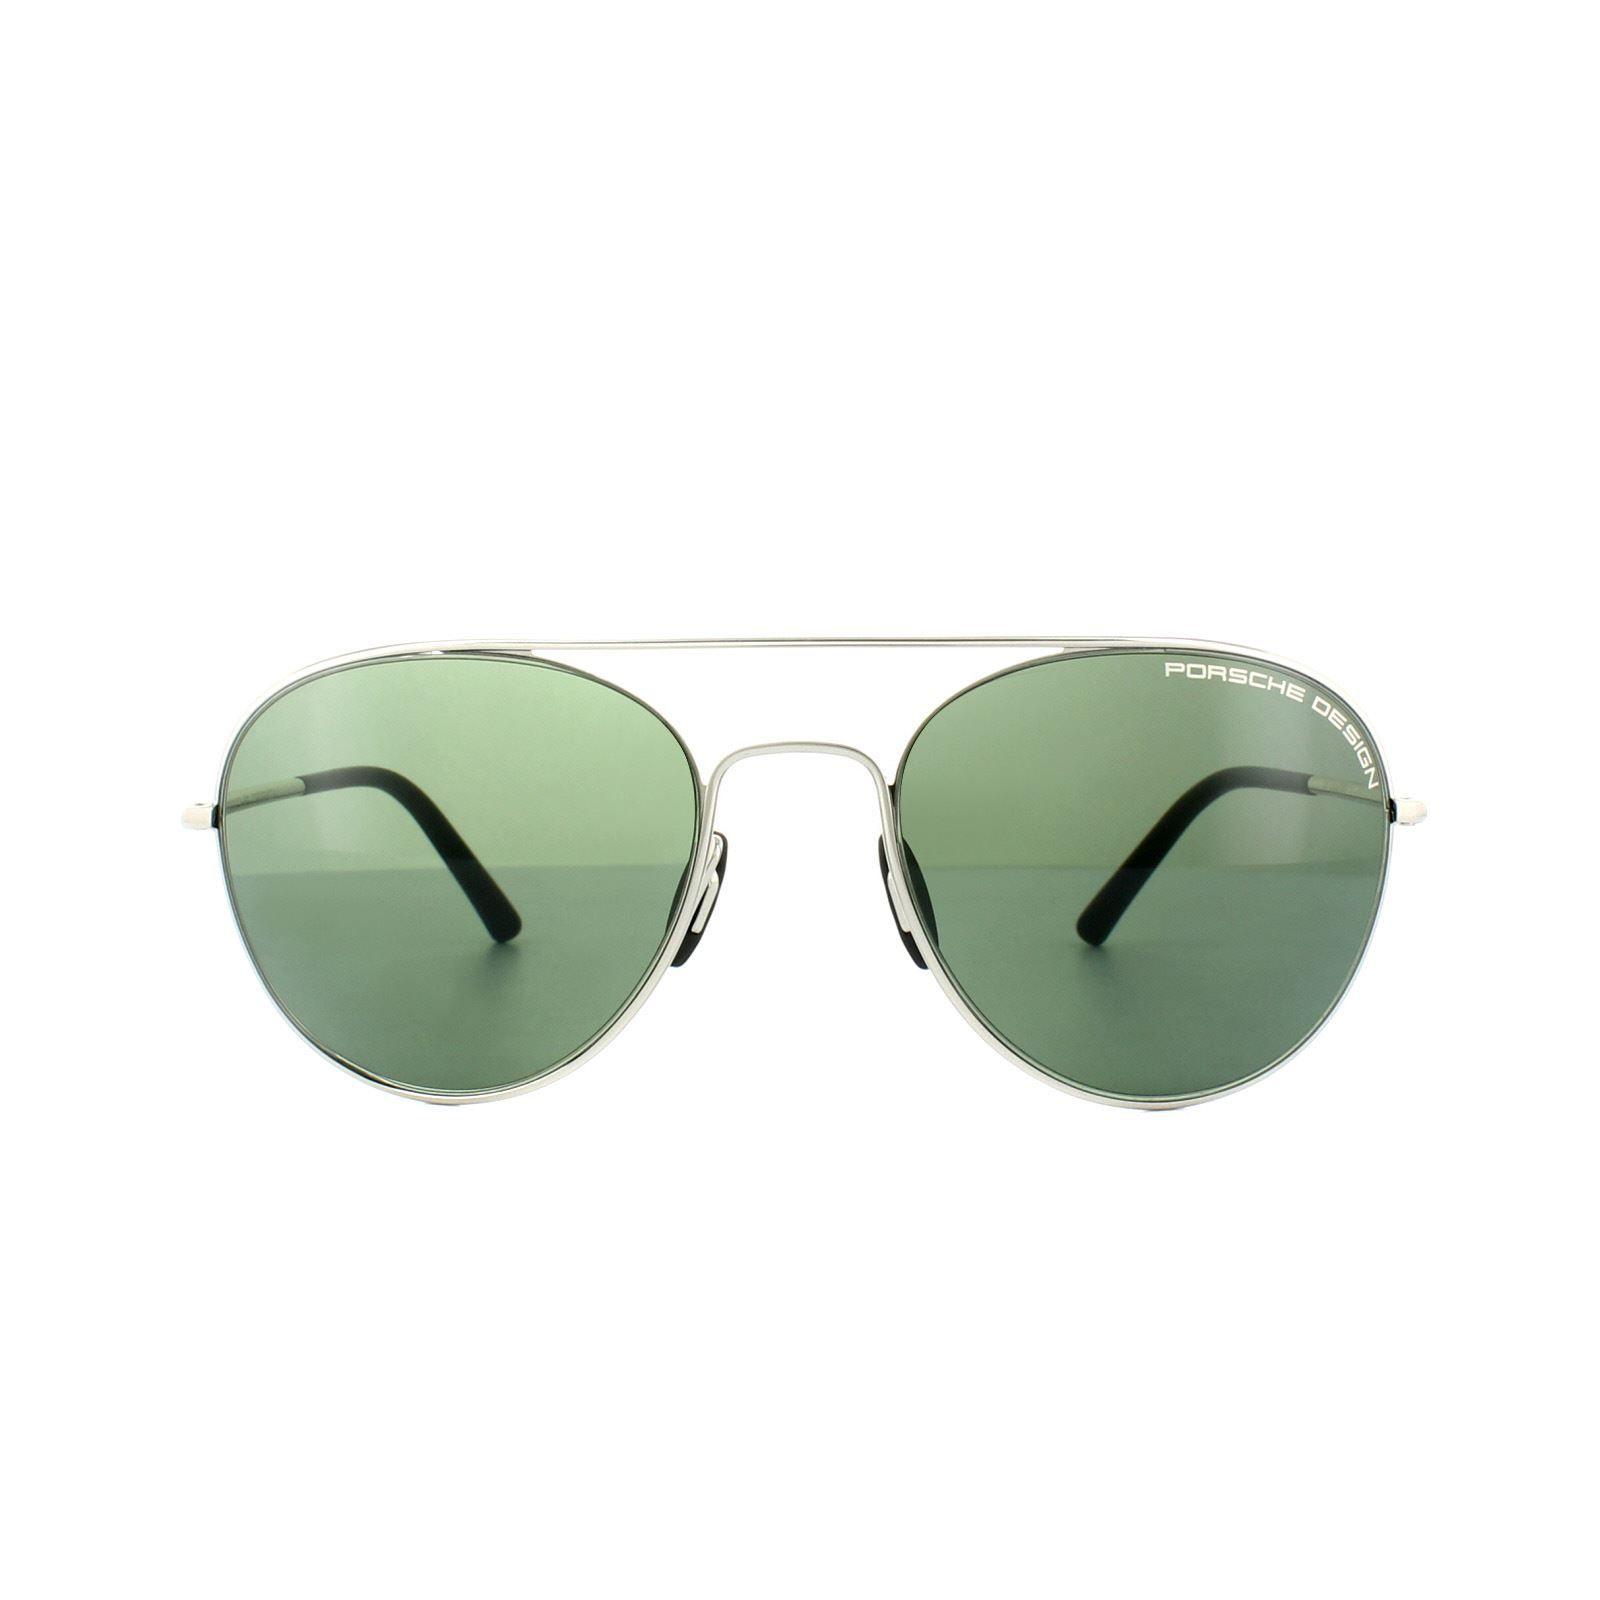 Porsche Design Sunglasses P8606 D V761 Palladium Green